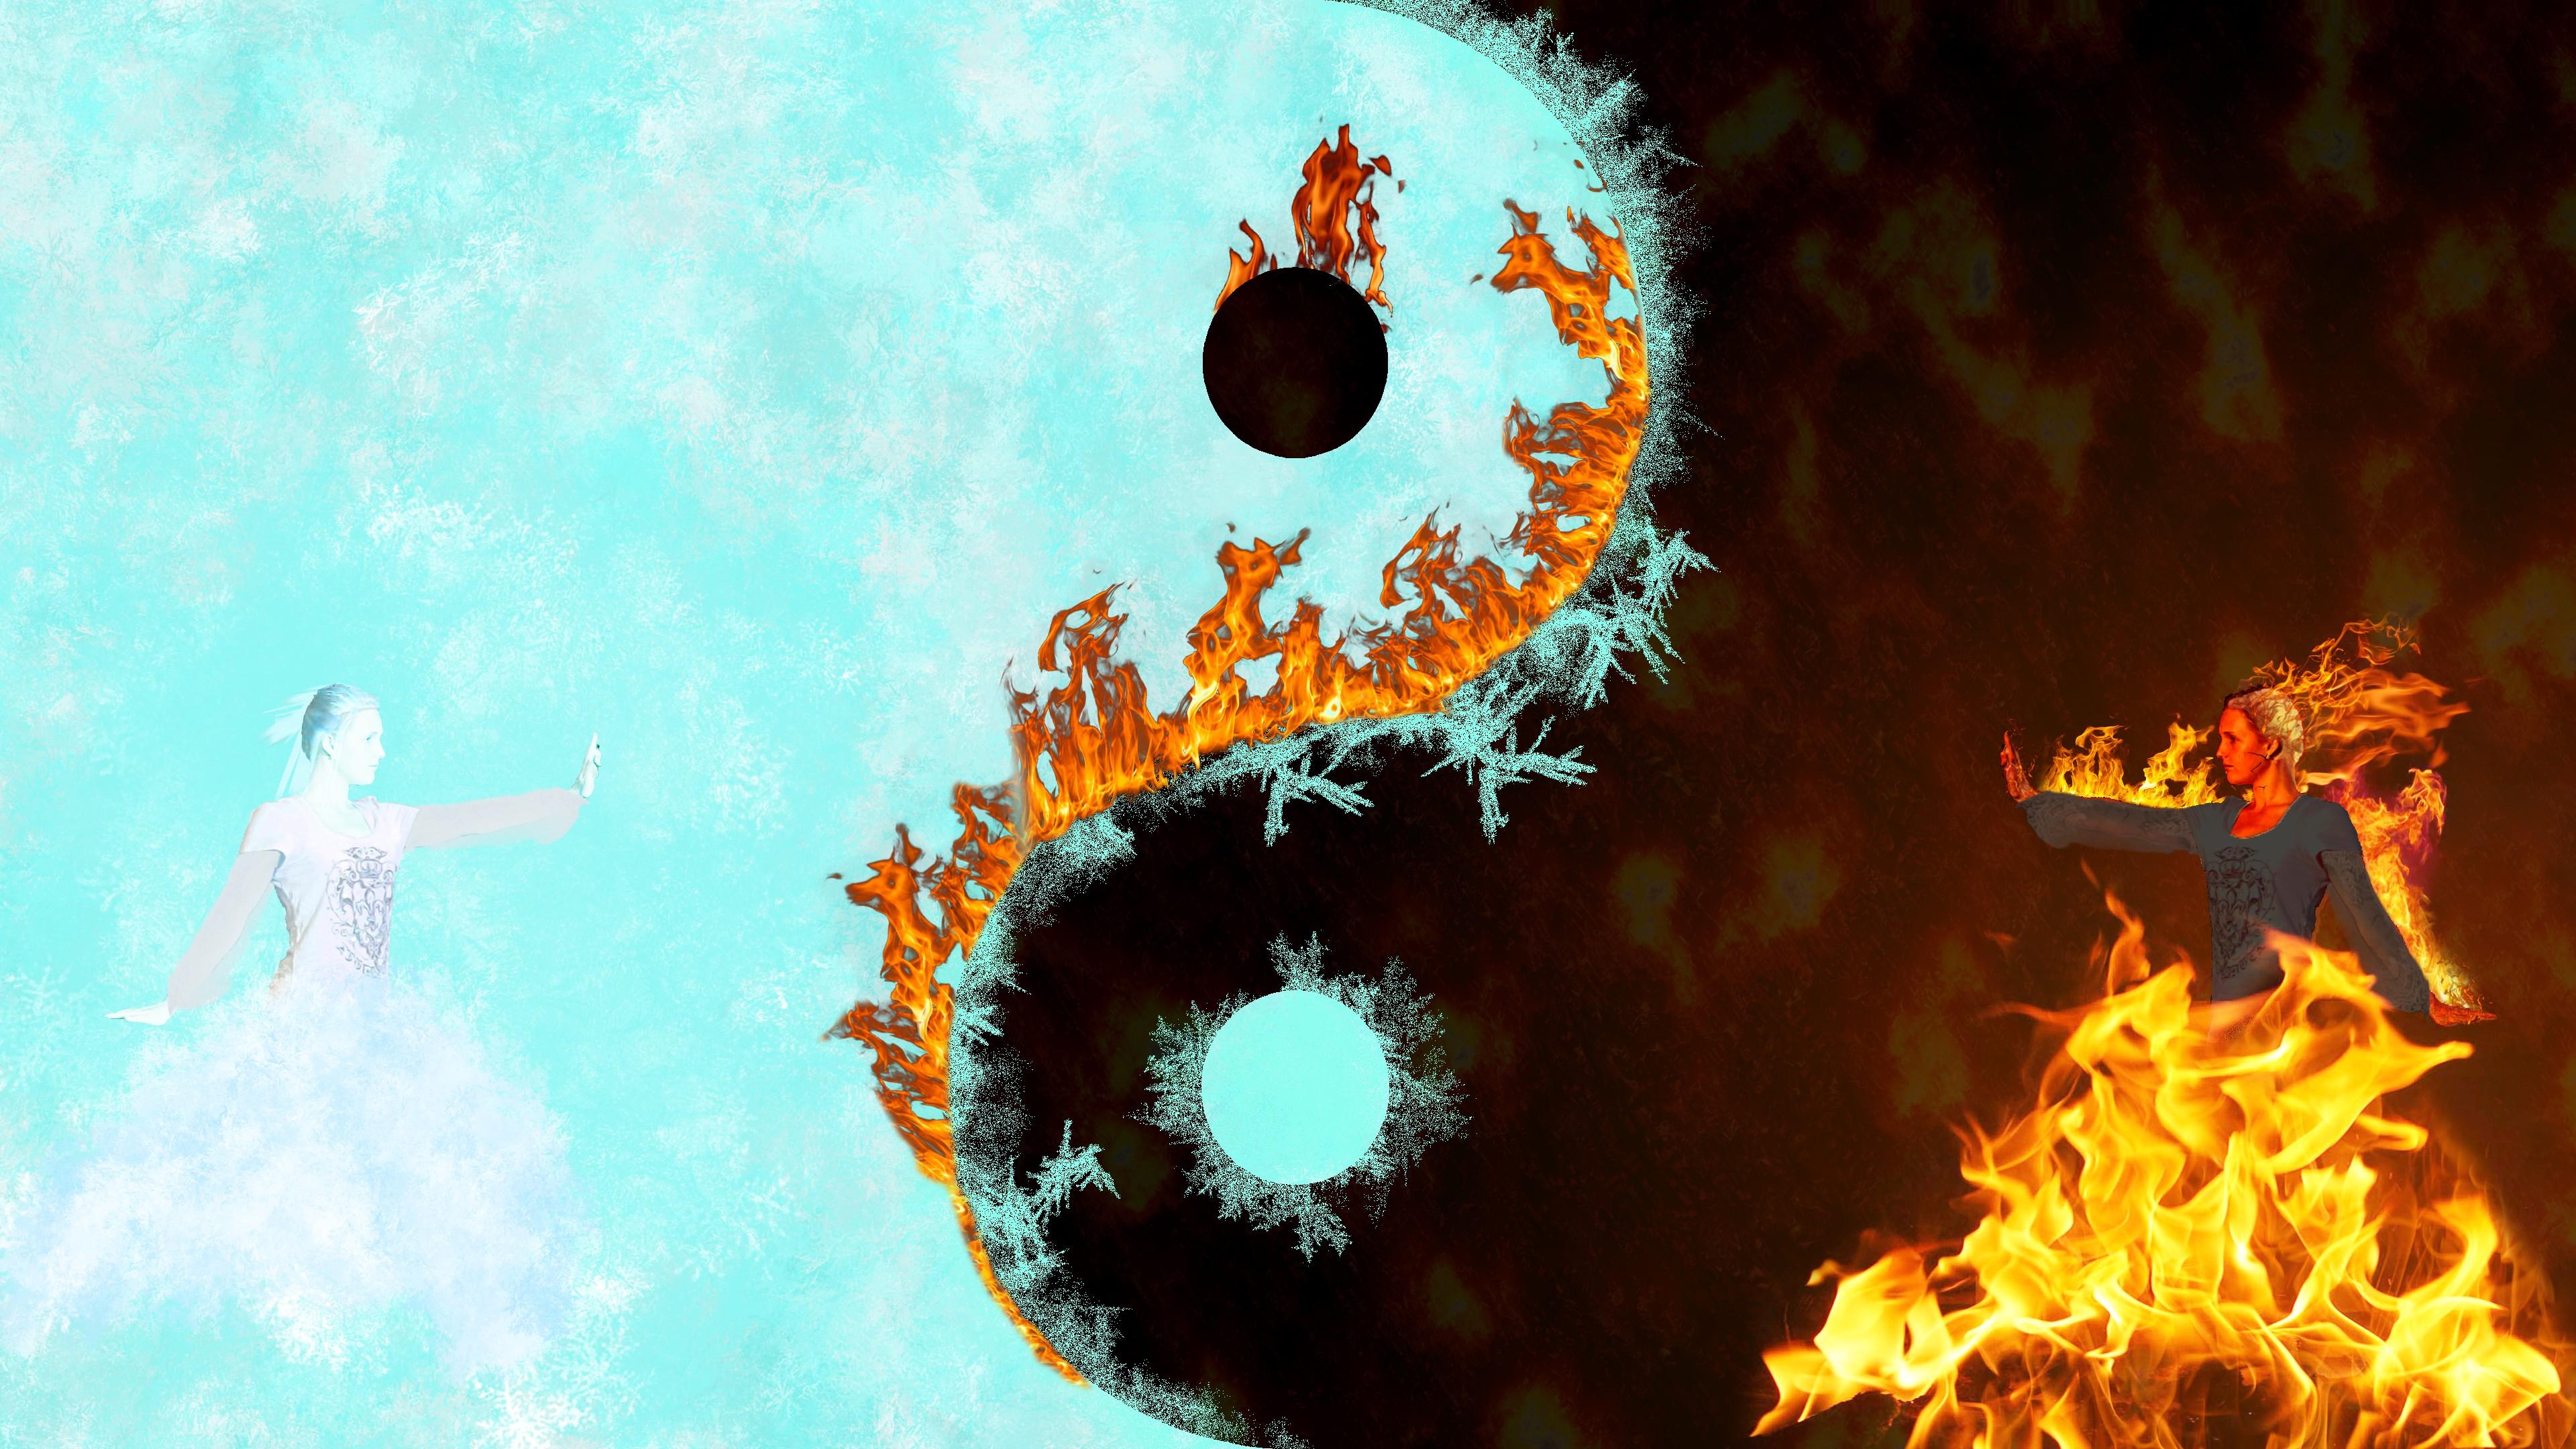 Wallpaper Illustration Ice Fire Yin And Yang Screenshot